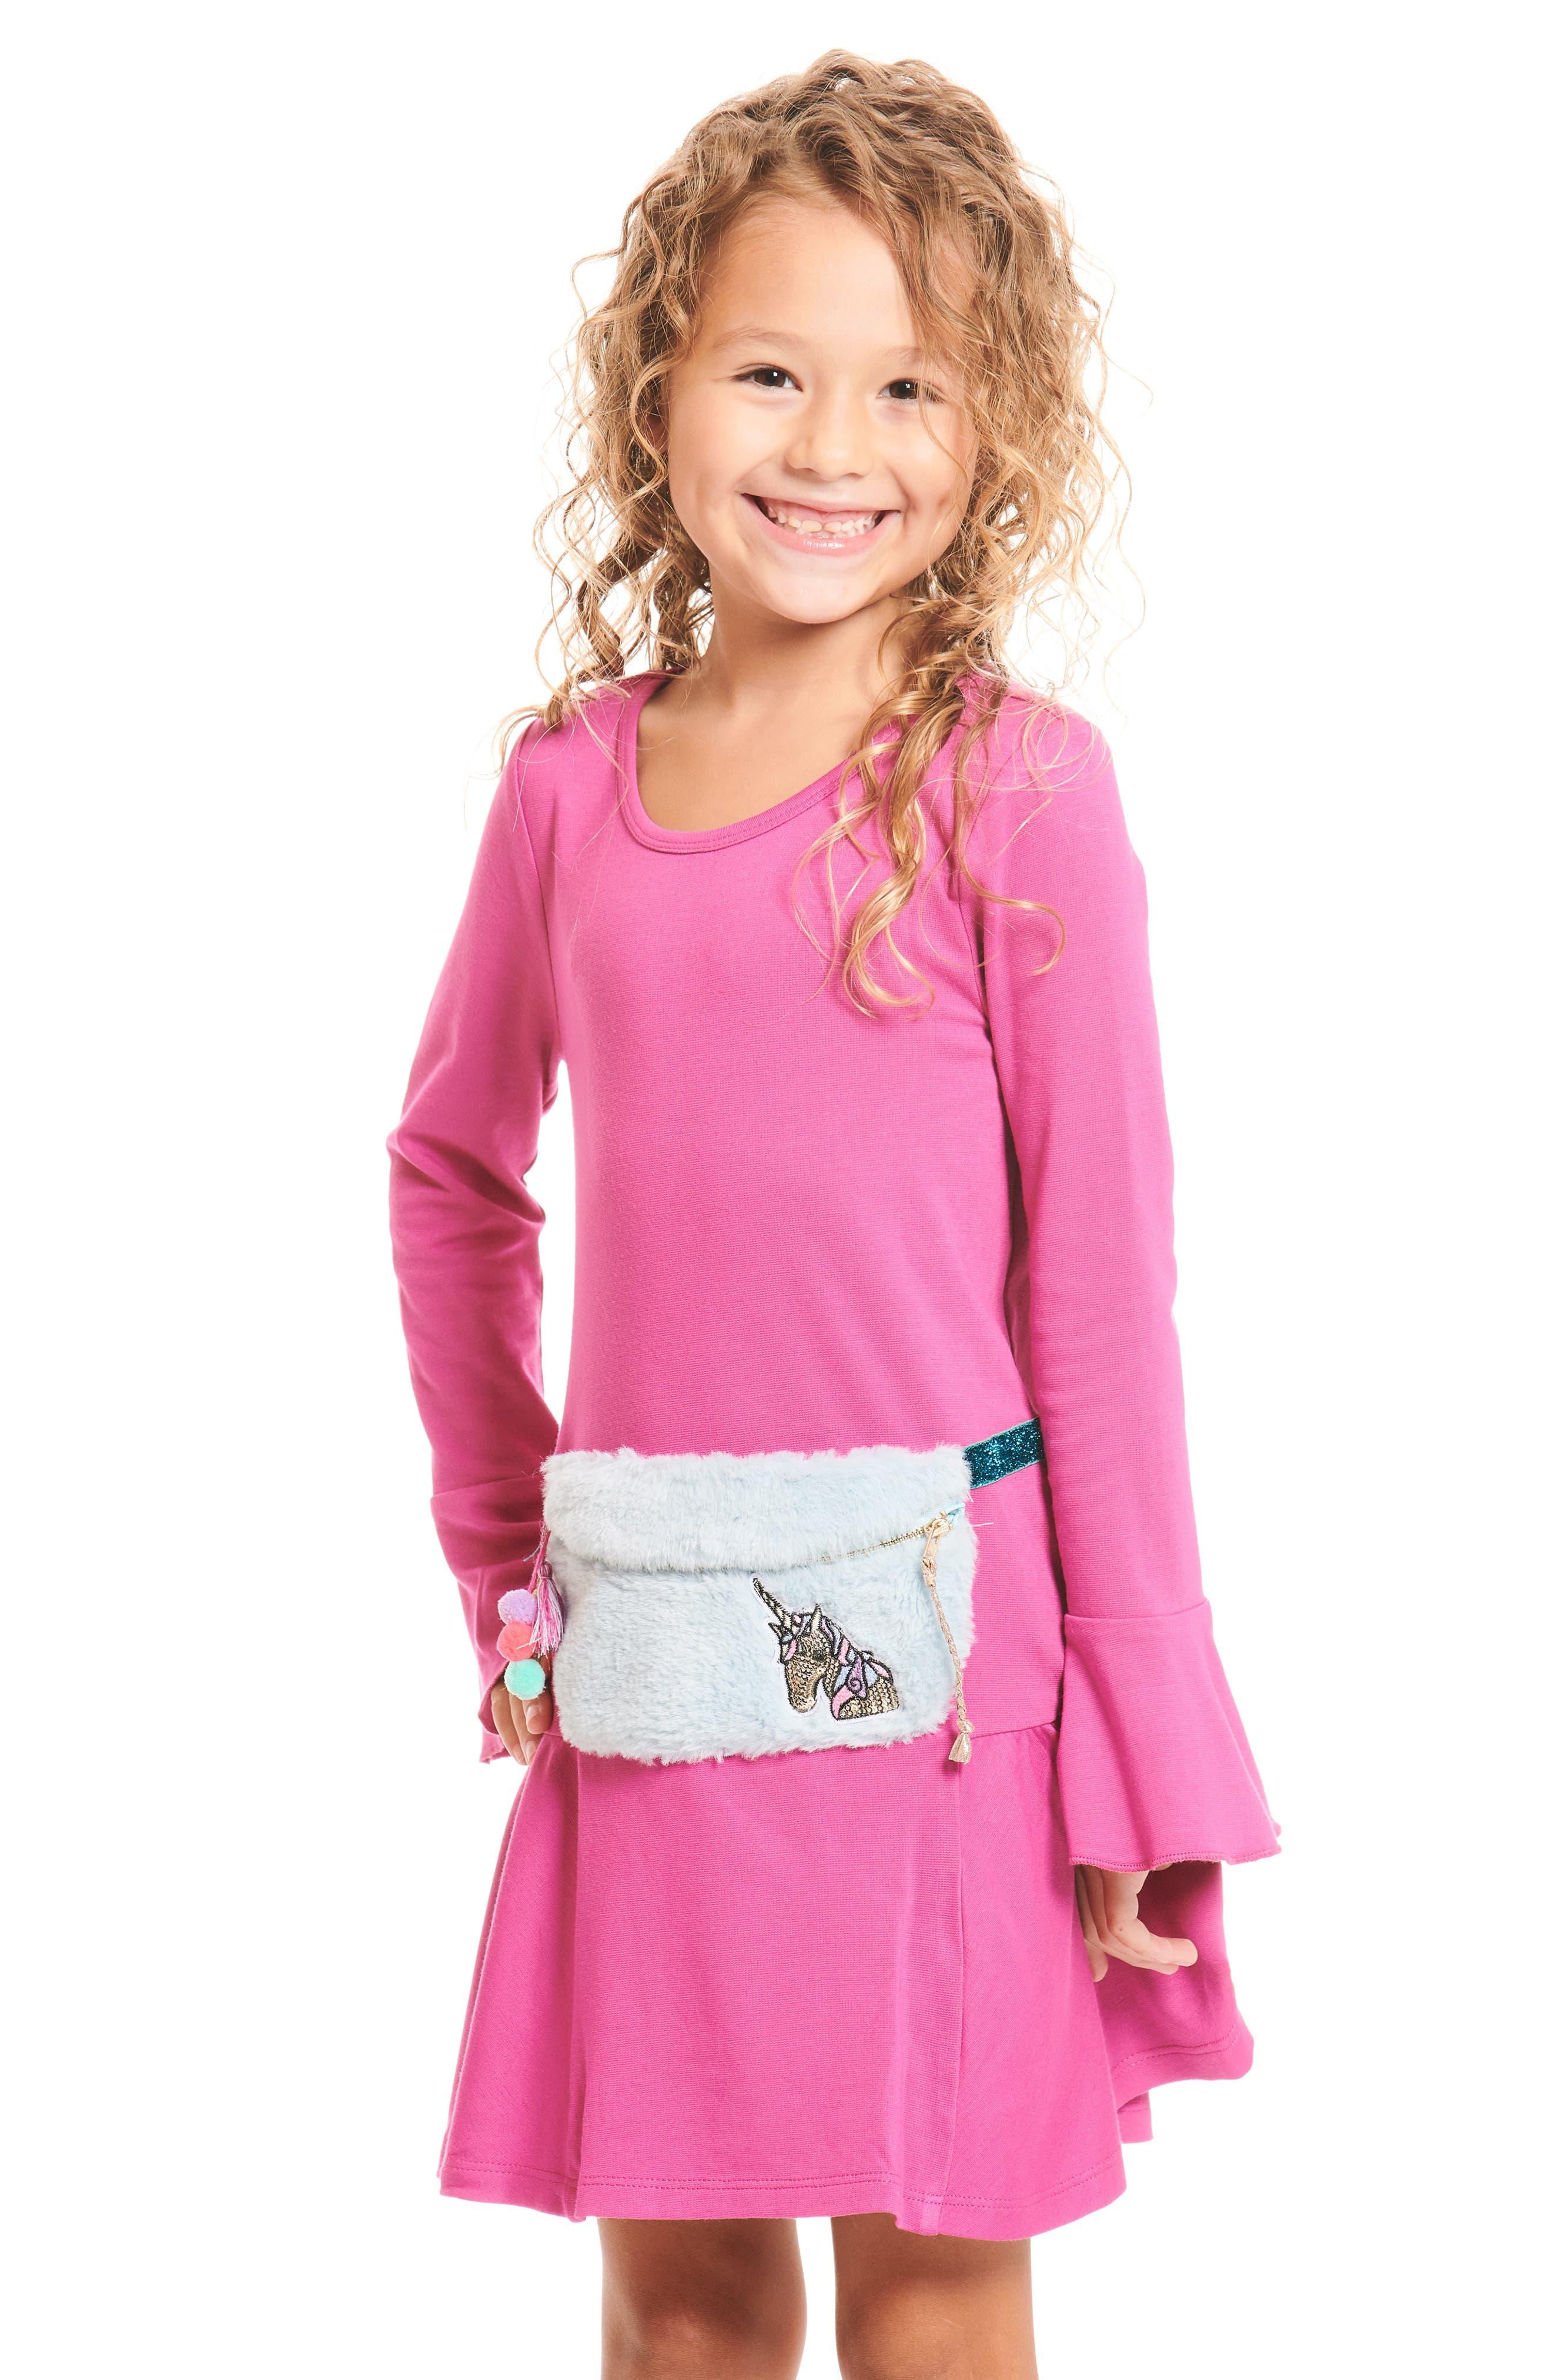 Knit Dress with Faux Fur Pouch,                             Main thumbnail 1, color,                             FUSCHIA